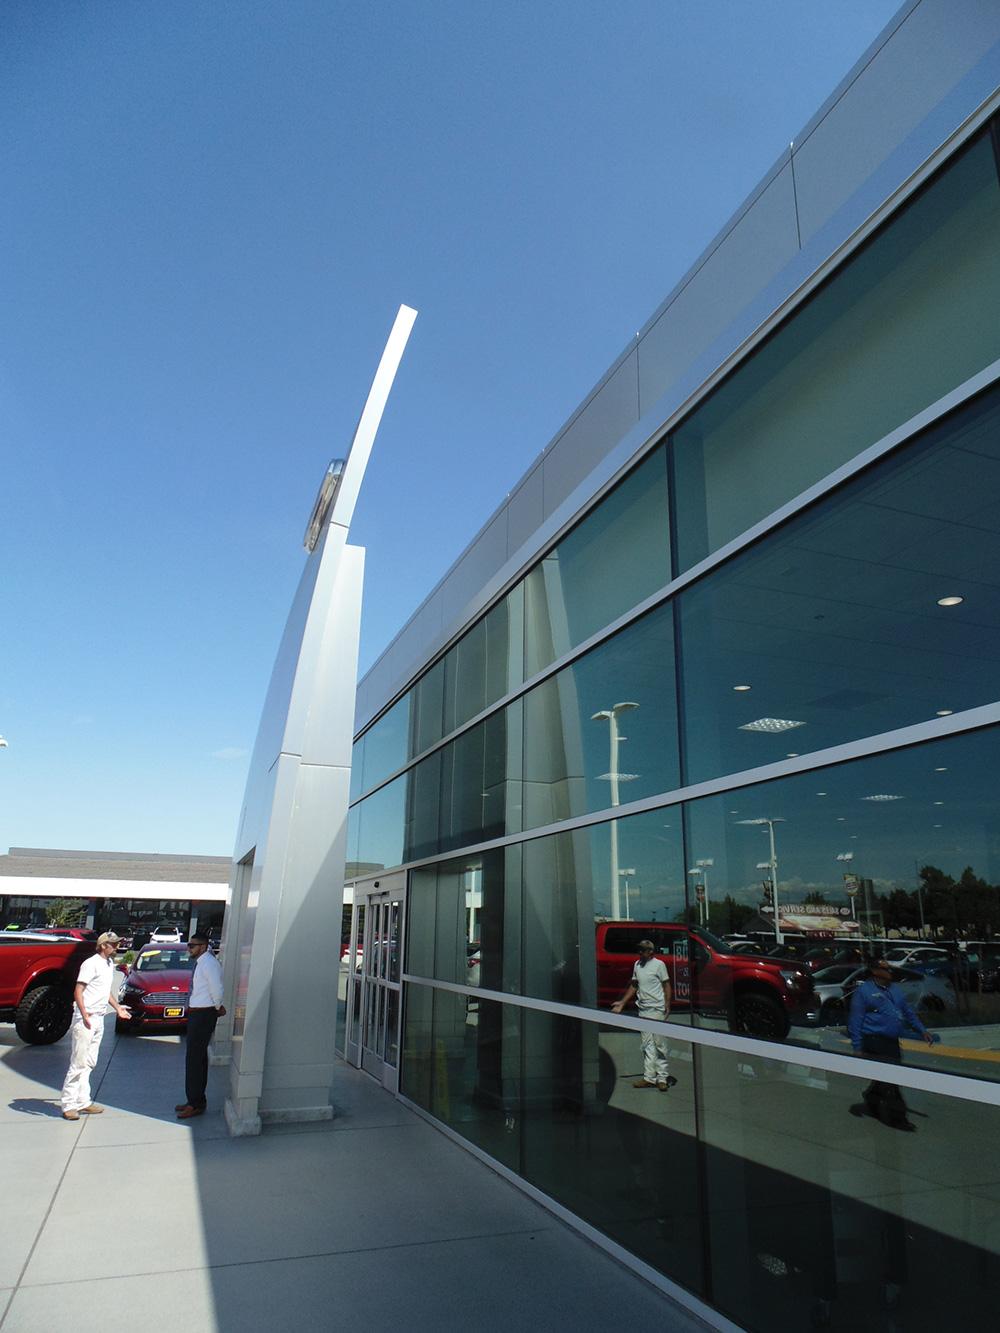 Future Ford - Clovis, CA